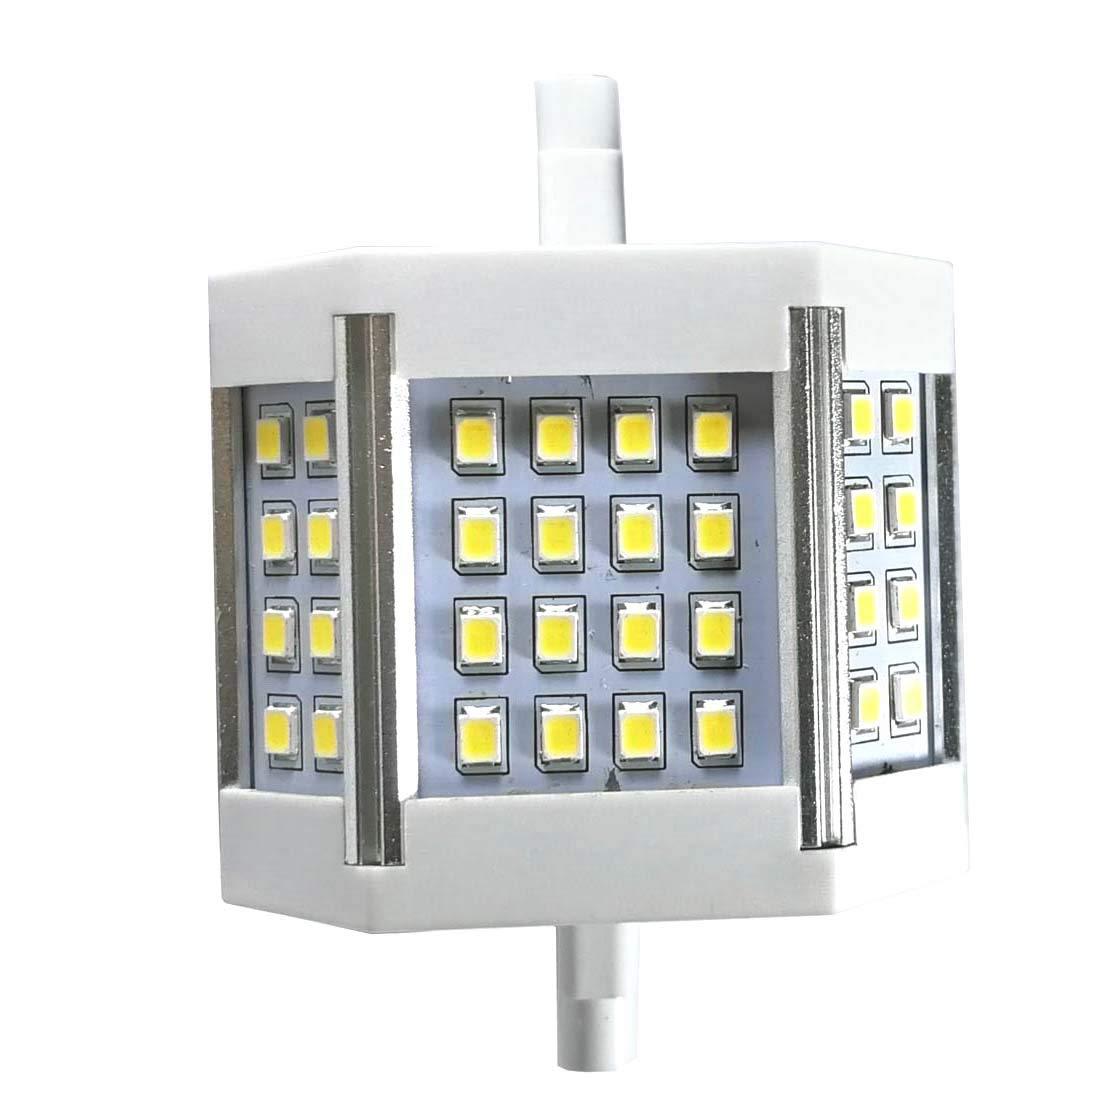 "qlee R7s Led 78mm Dimmable 3"" J78 120v 100w Tungsten Halogen Lamp Replacement Bulb Double Ended J Type Spotlight Desktop Floodlight Floor Standing Reading Work Light Warm White"